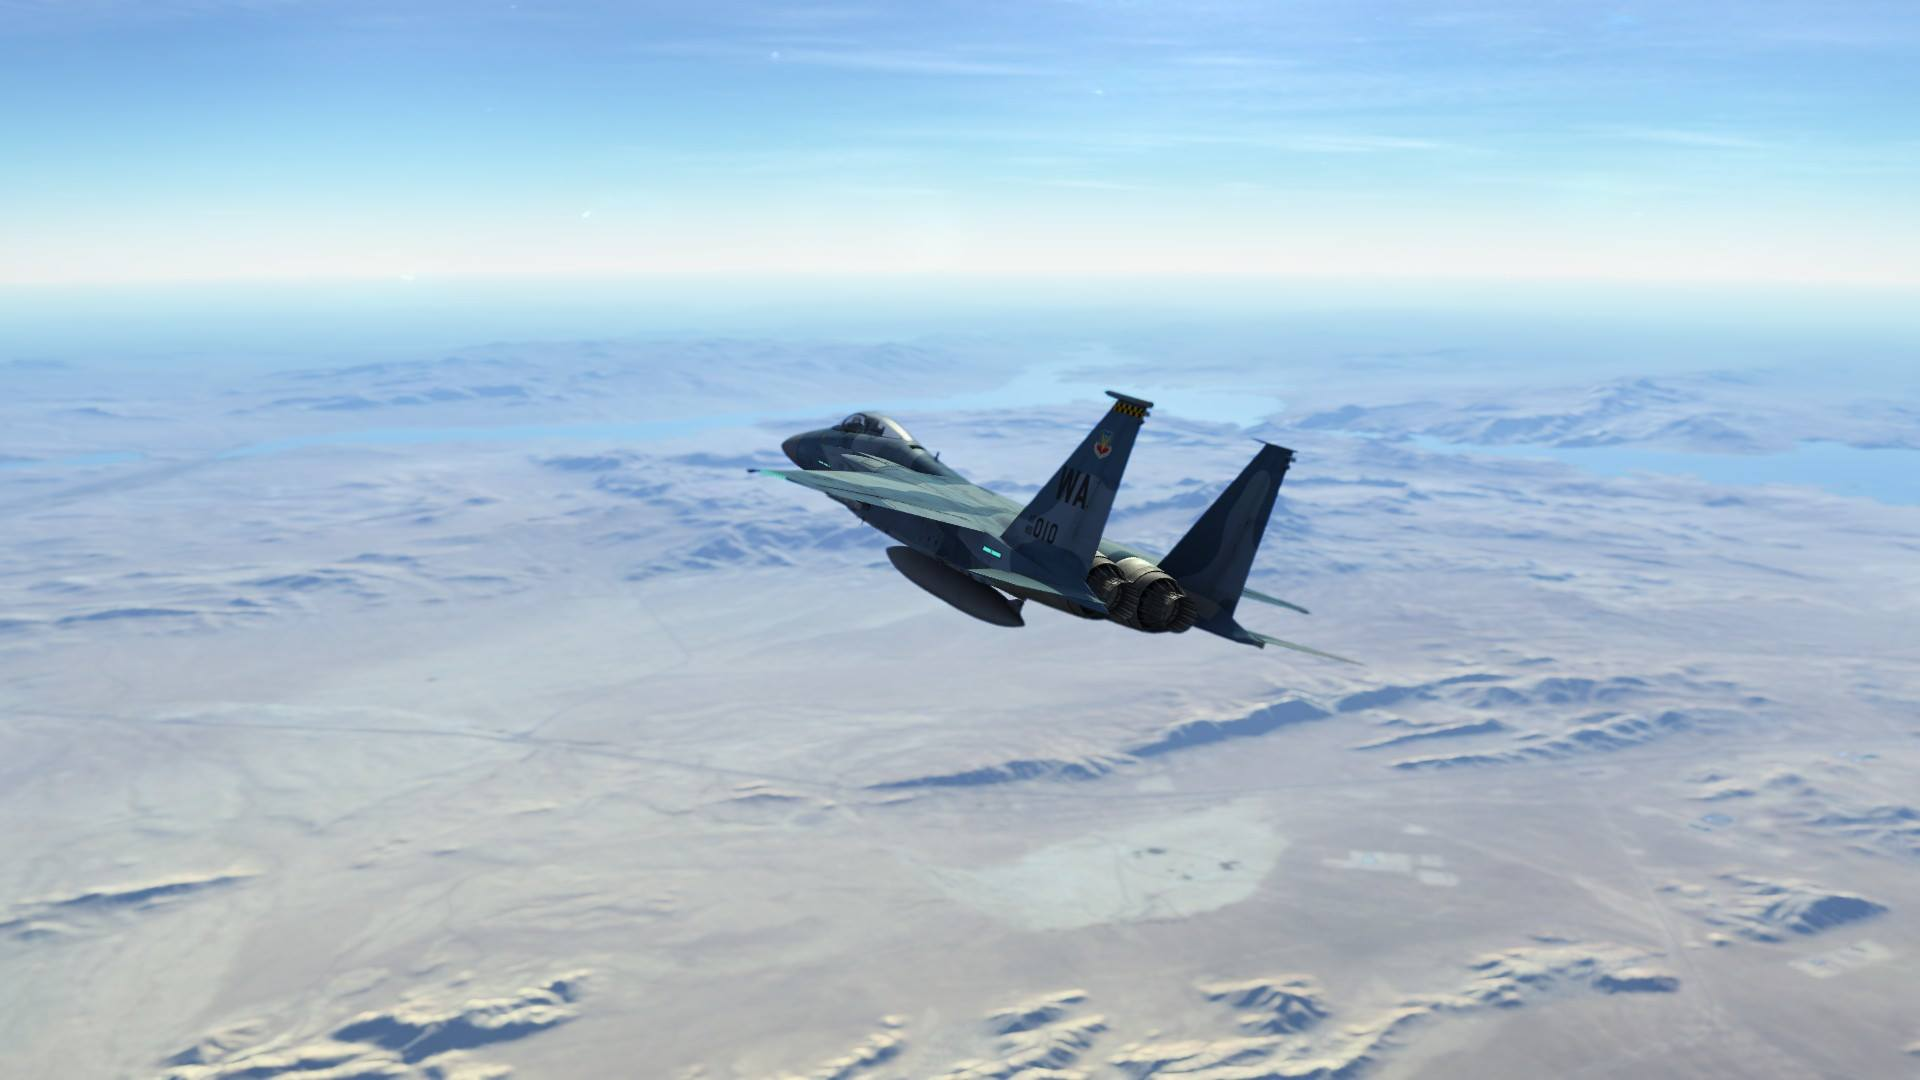 DCS: NEVADA Test and Training Range Map Fiyat Karşılaştırma